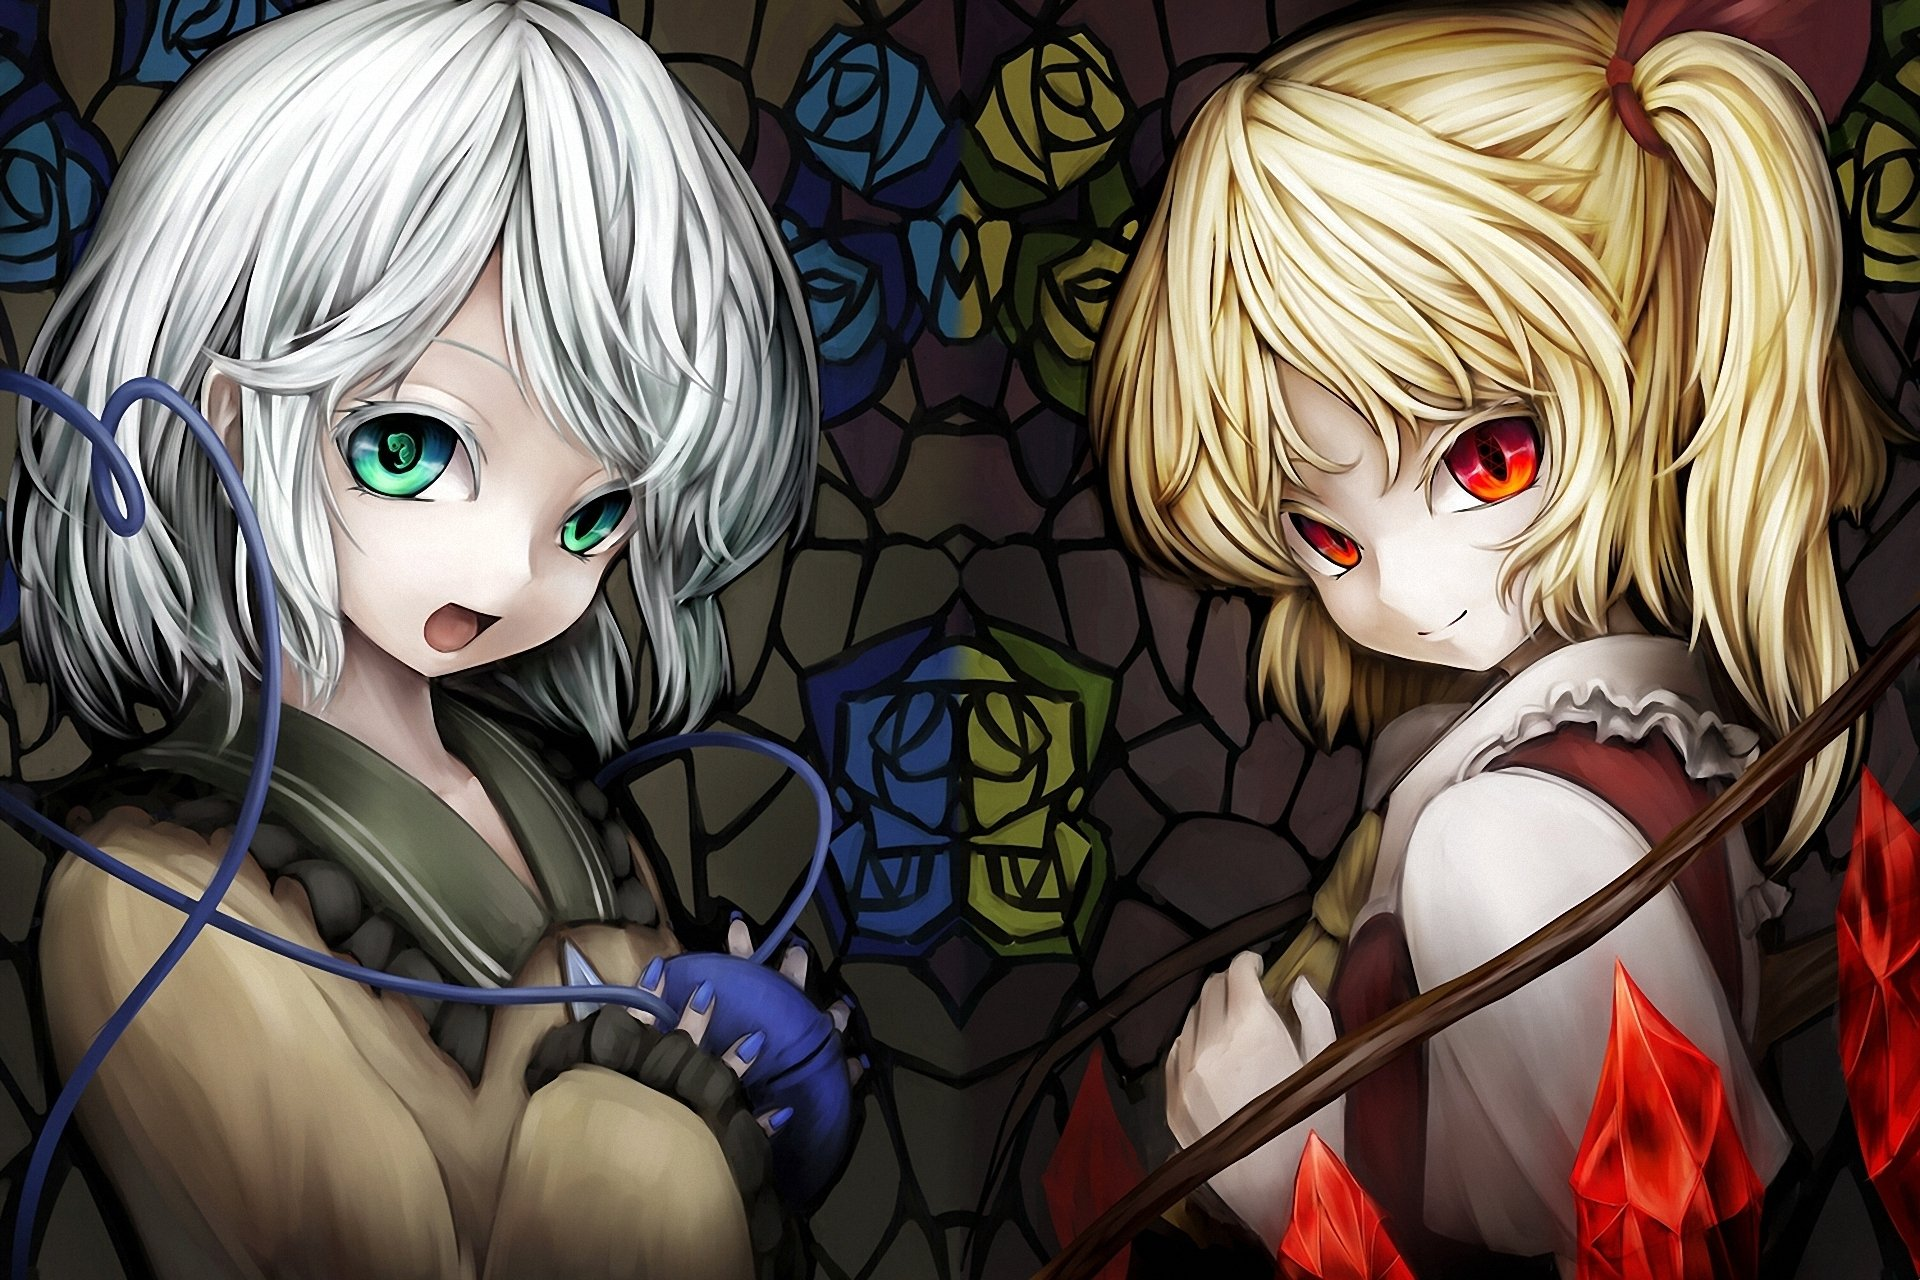 Anime - Touhou  Flandre Scarlet Koishi Komeiji Wallpaper